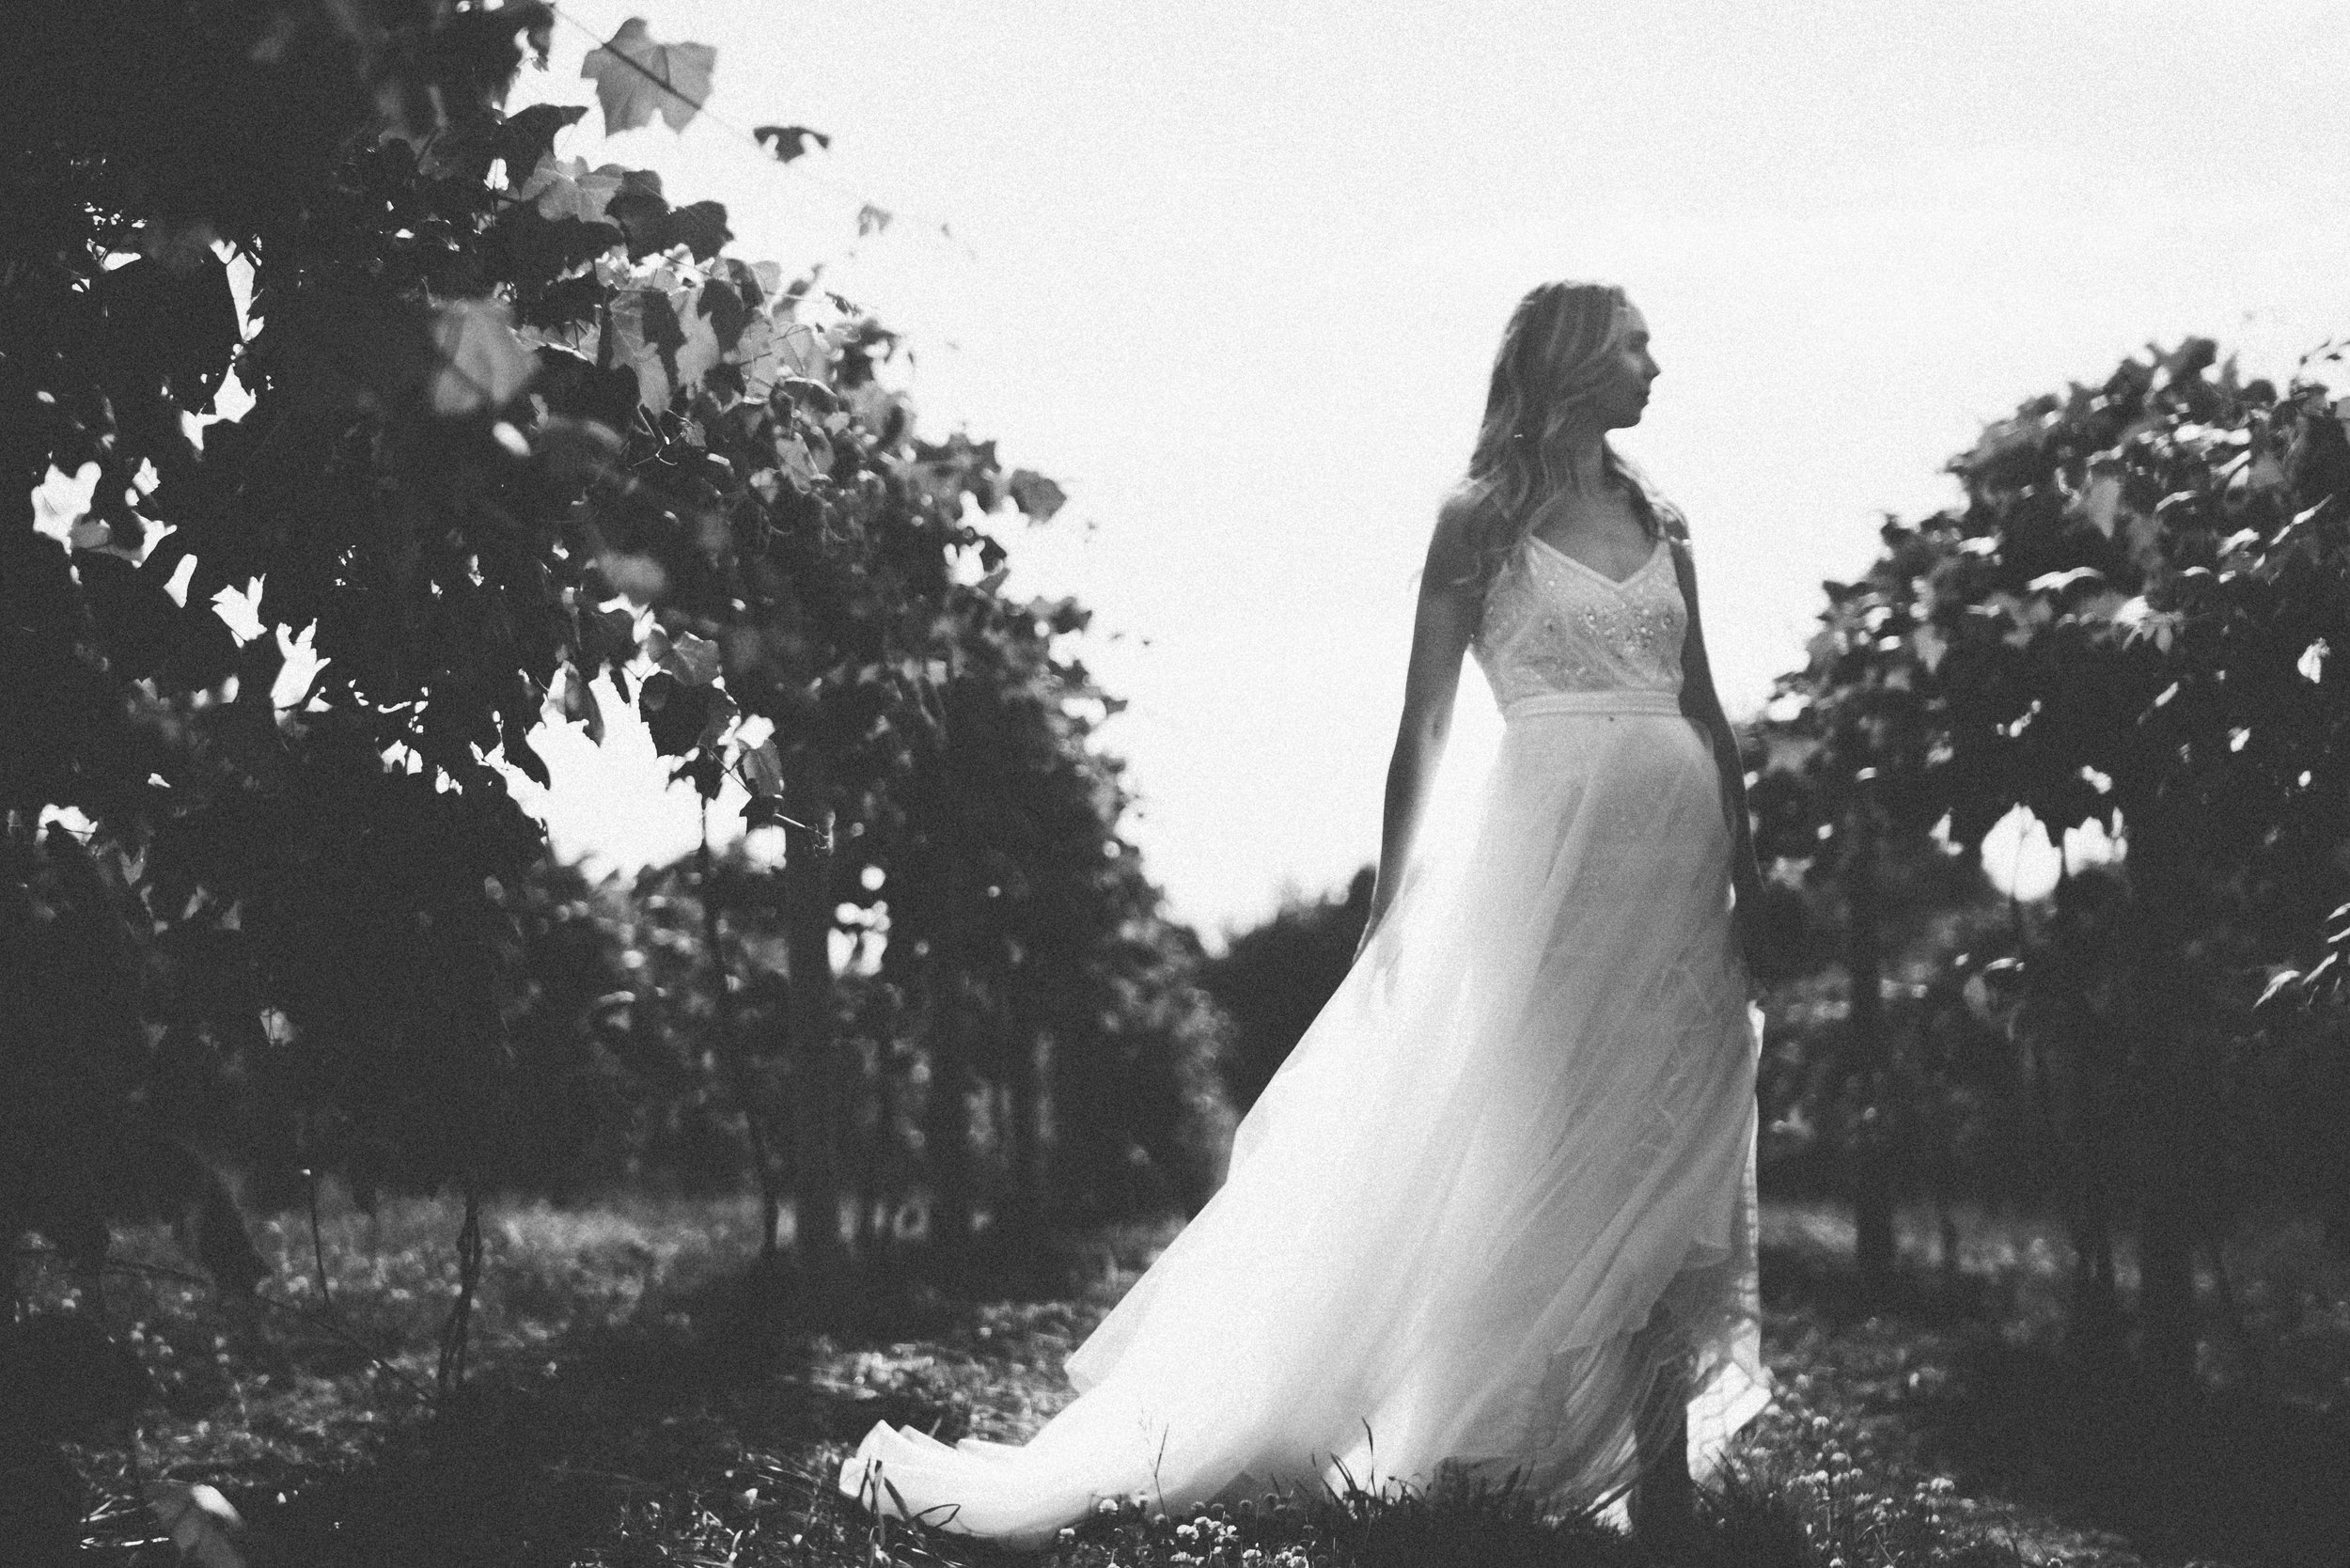 michigan-wedding-photography-videography-videographer-cinematographer-cinematographers-cinematography-award-winning-chicago